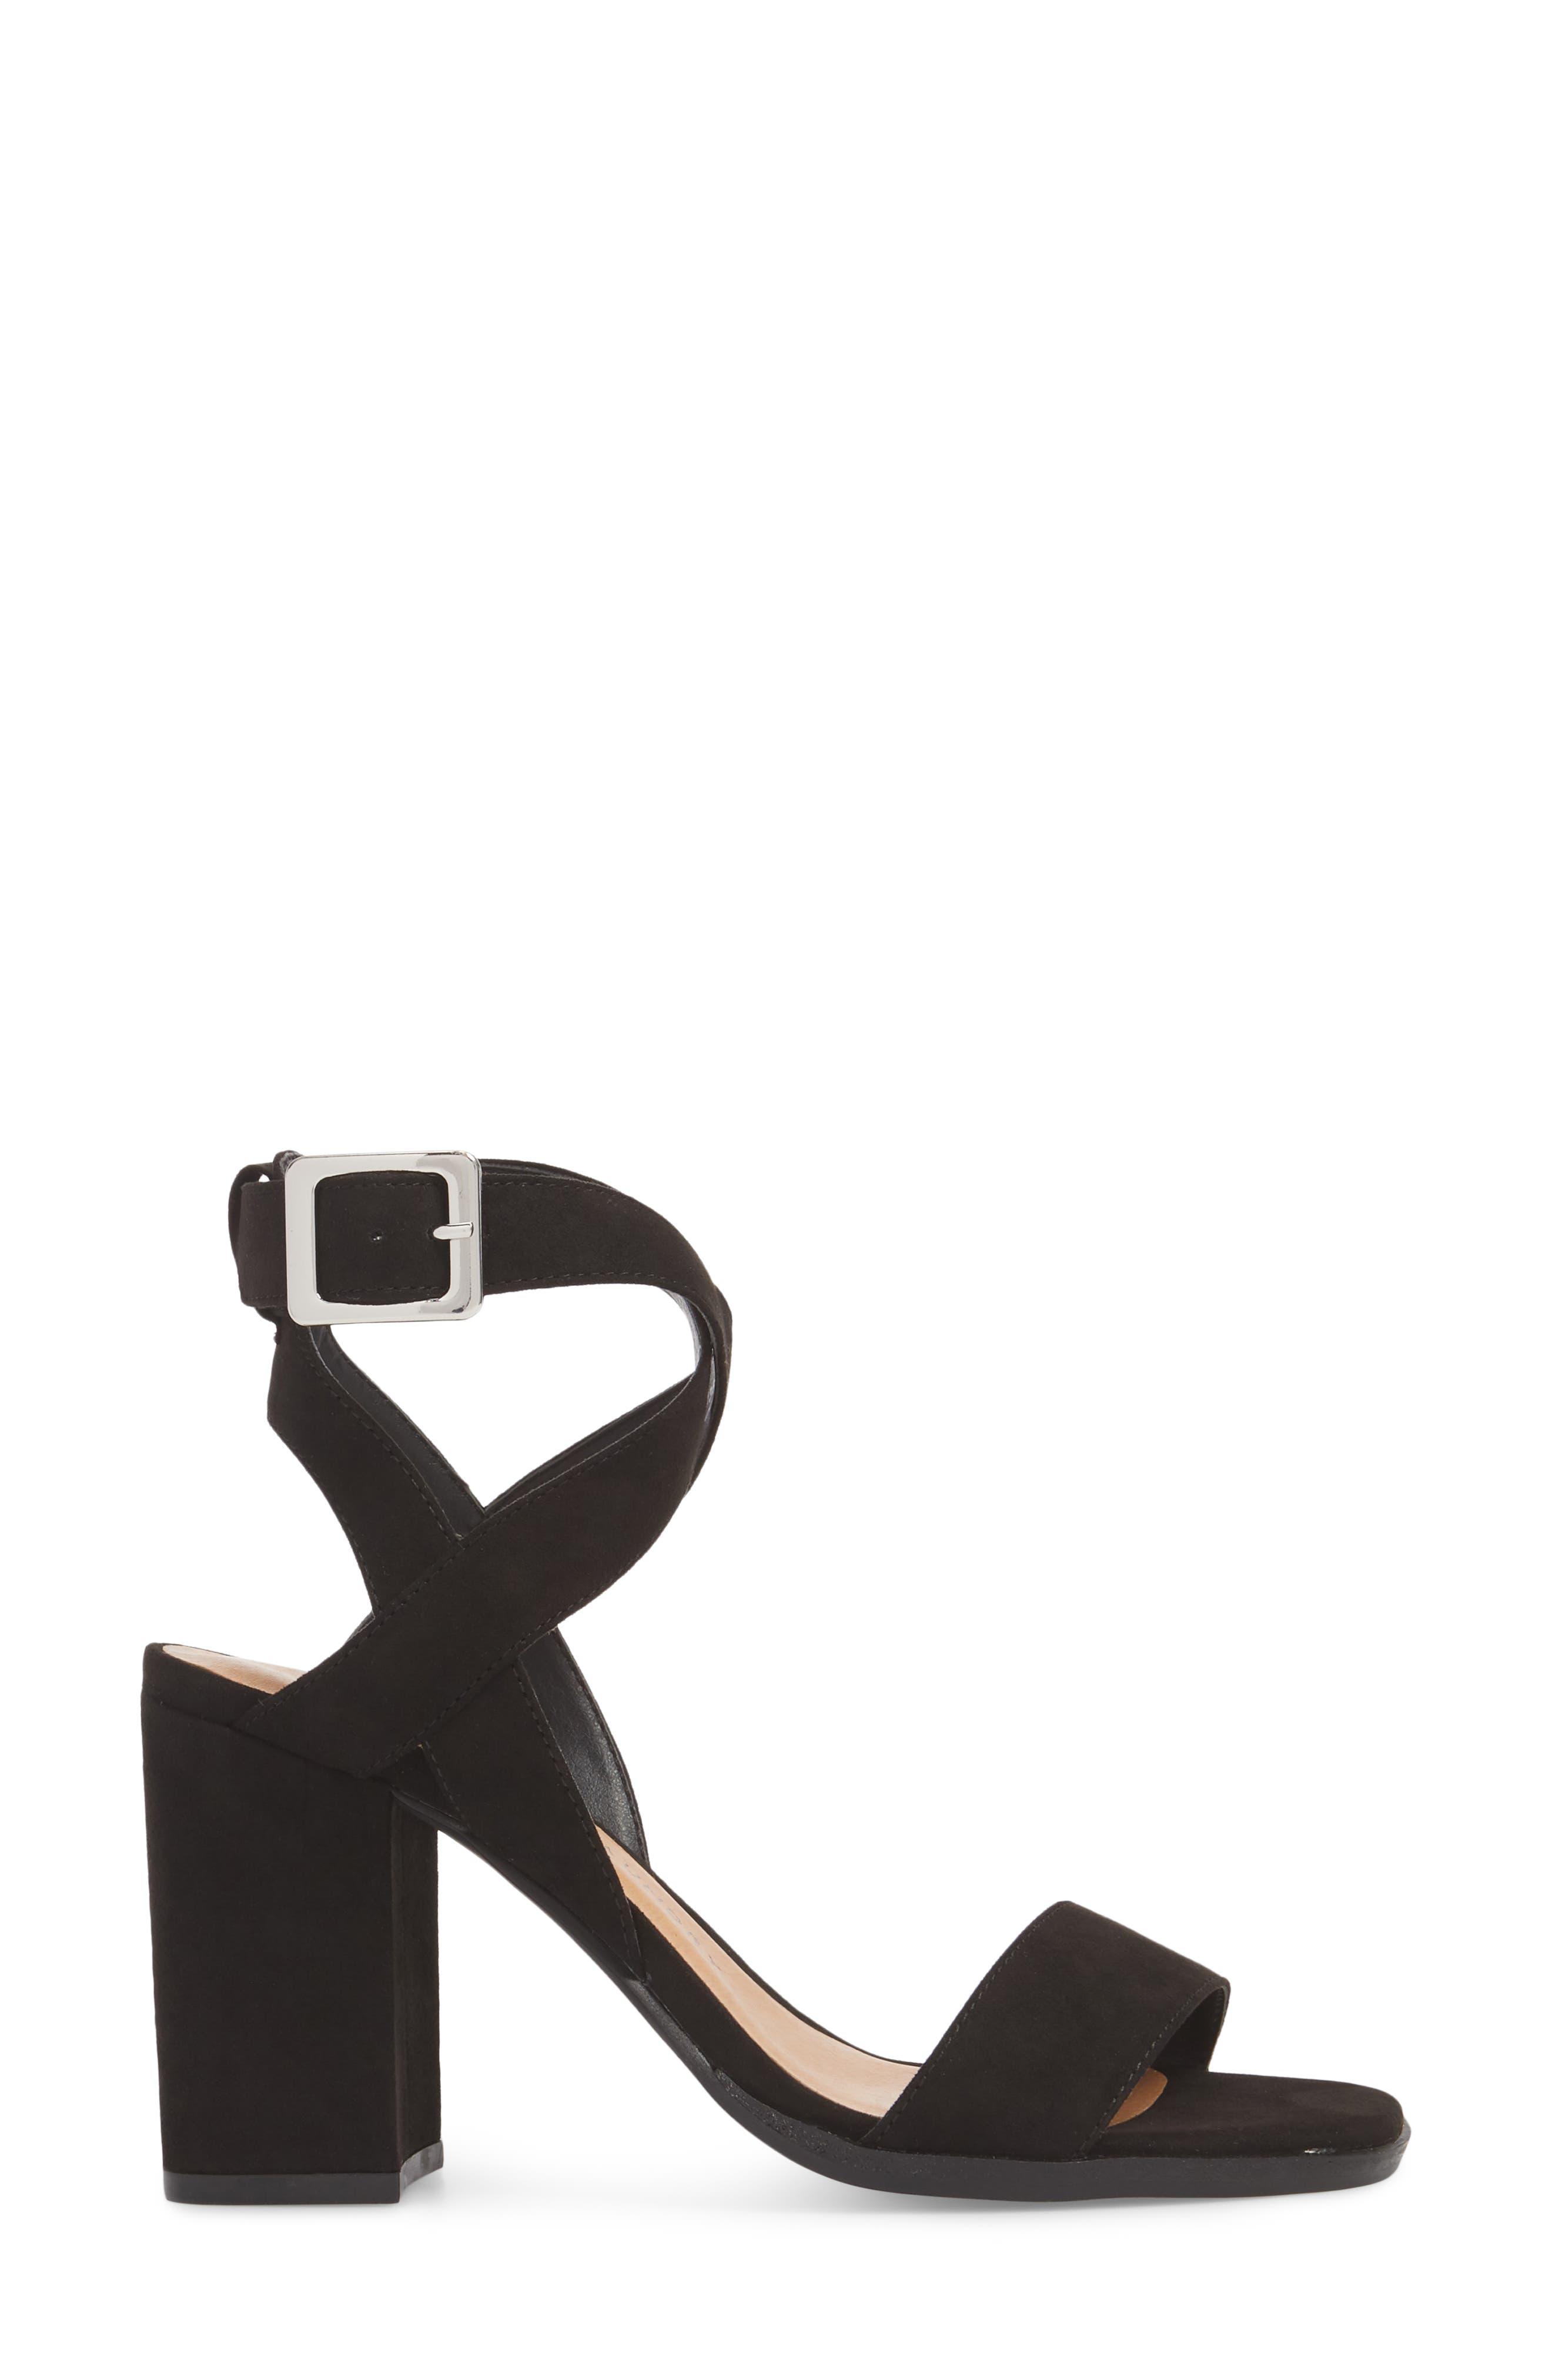 Stassi Block Heel Sandal,                             Alternate thumbnail 3, color,                             Black